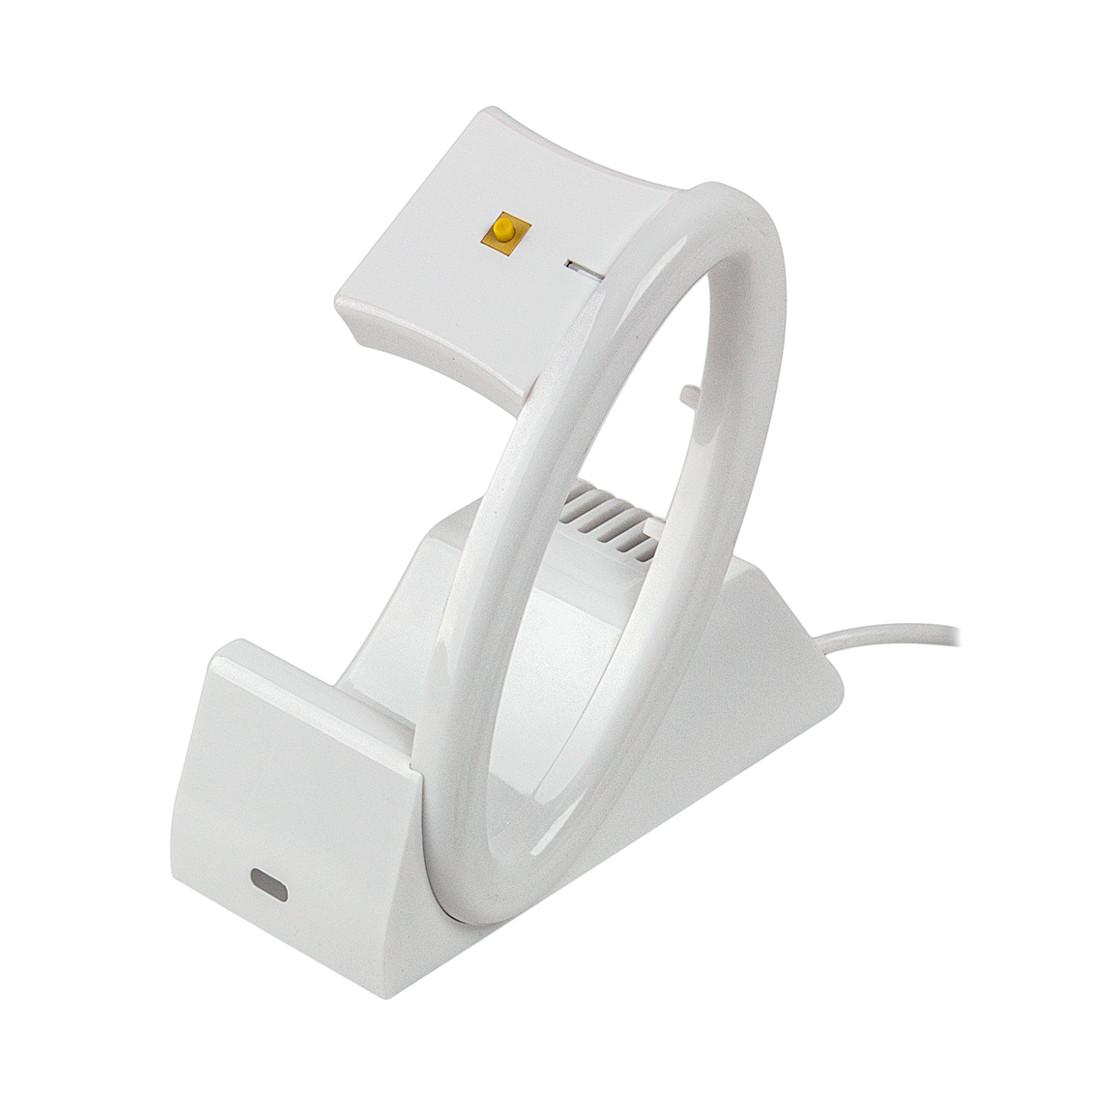 Противокражная подставка-зарядка для для смарт часов, Eagle, A301W